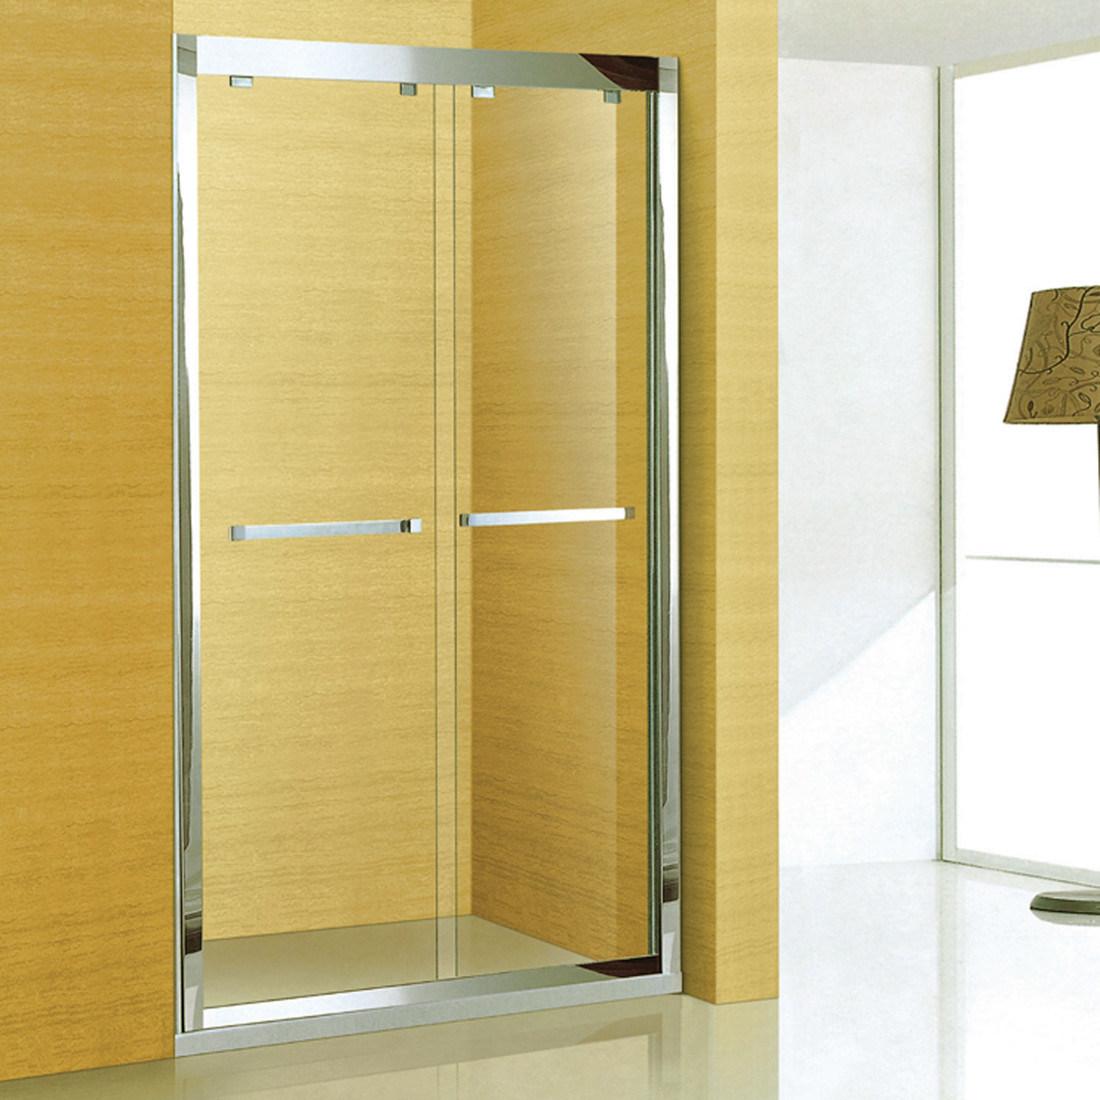 Sanitry Ware 304 Stainless Steel Frame Bathroom Shower Screen (A-8955)